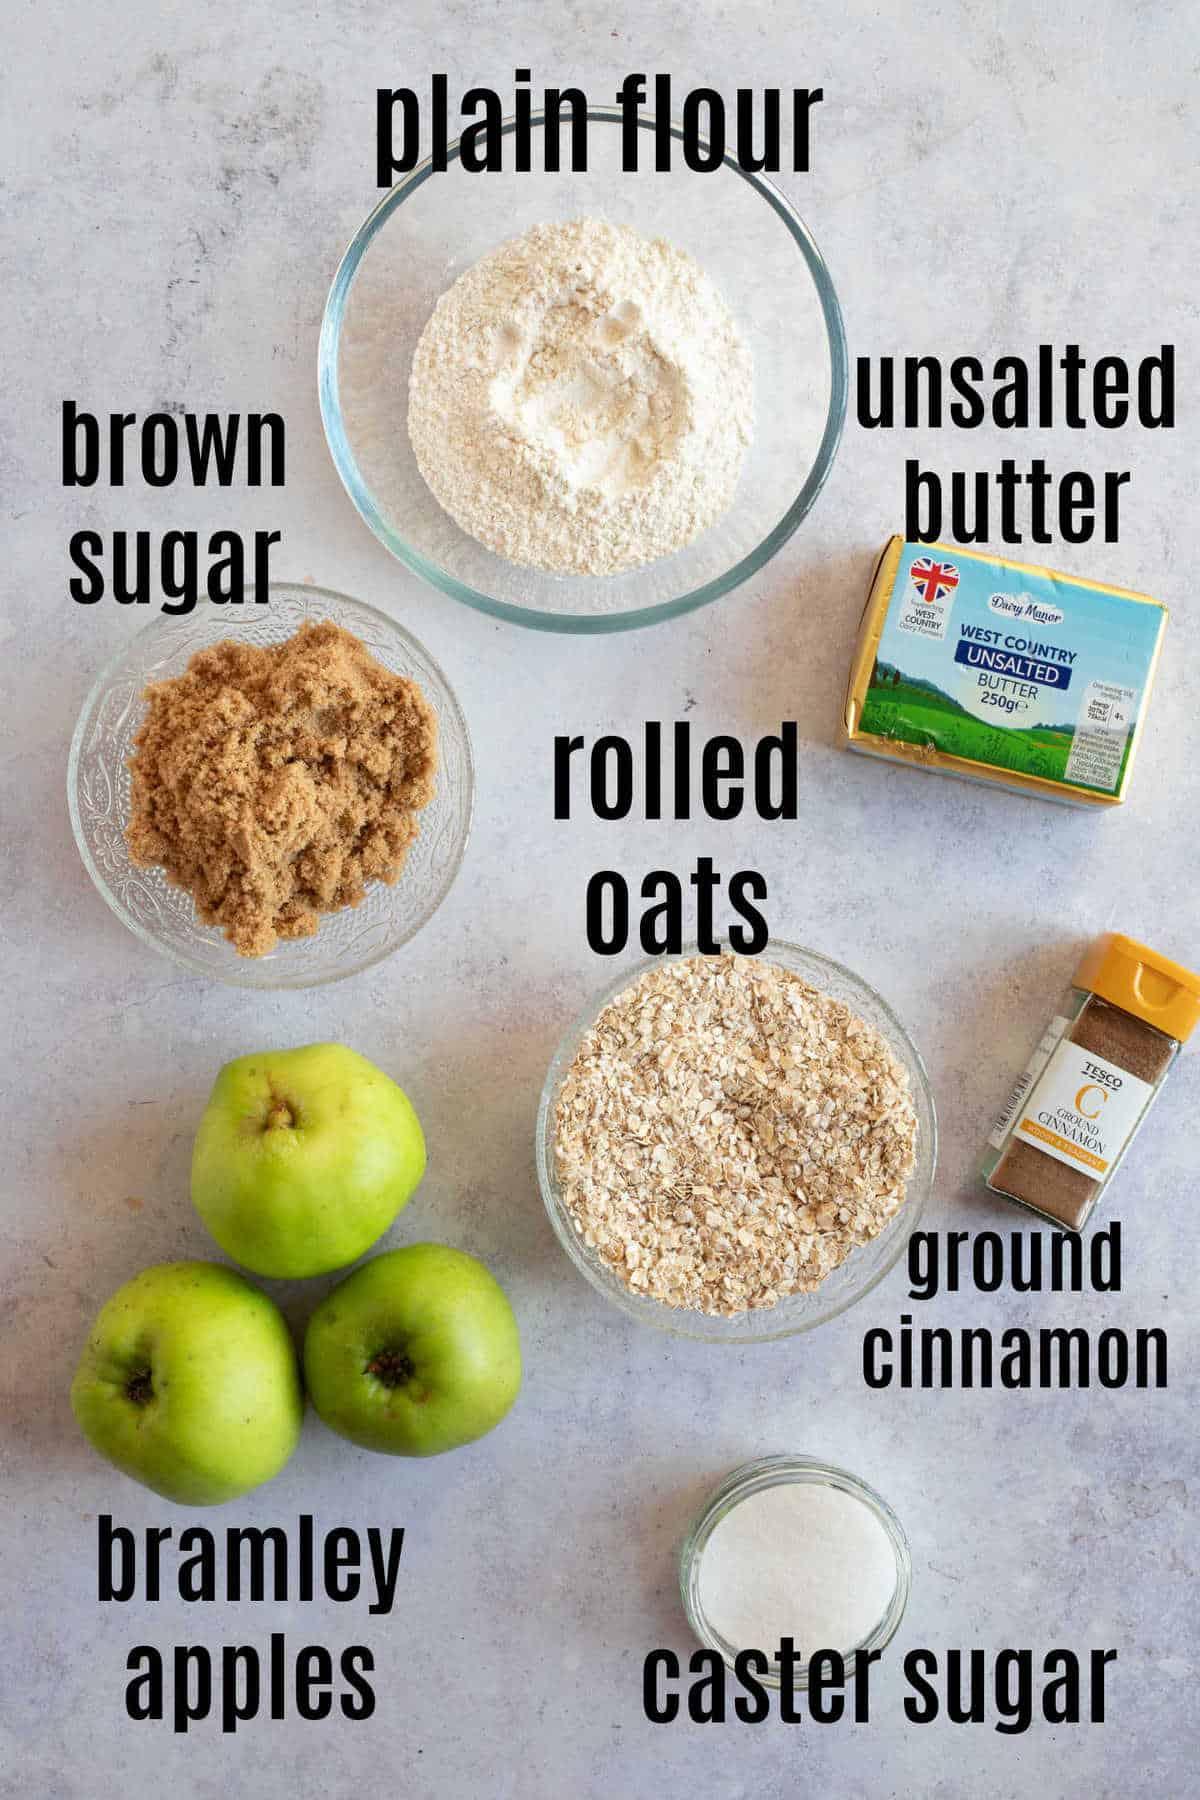 Ingredients for cinnamon apple crumble.